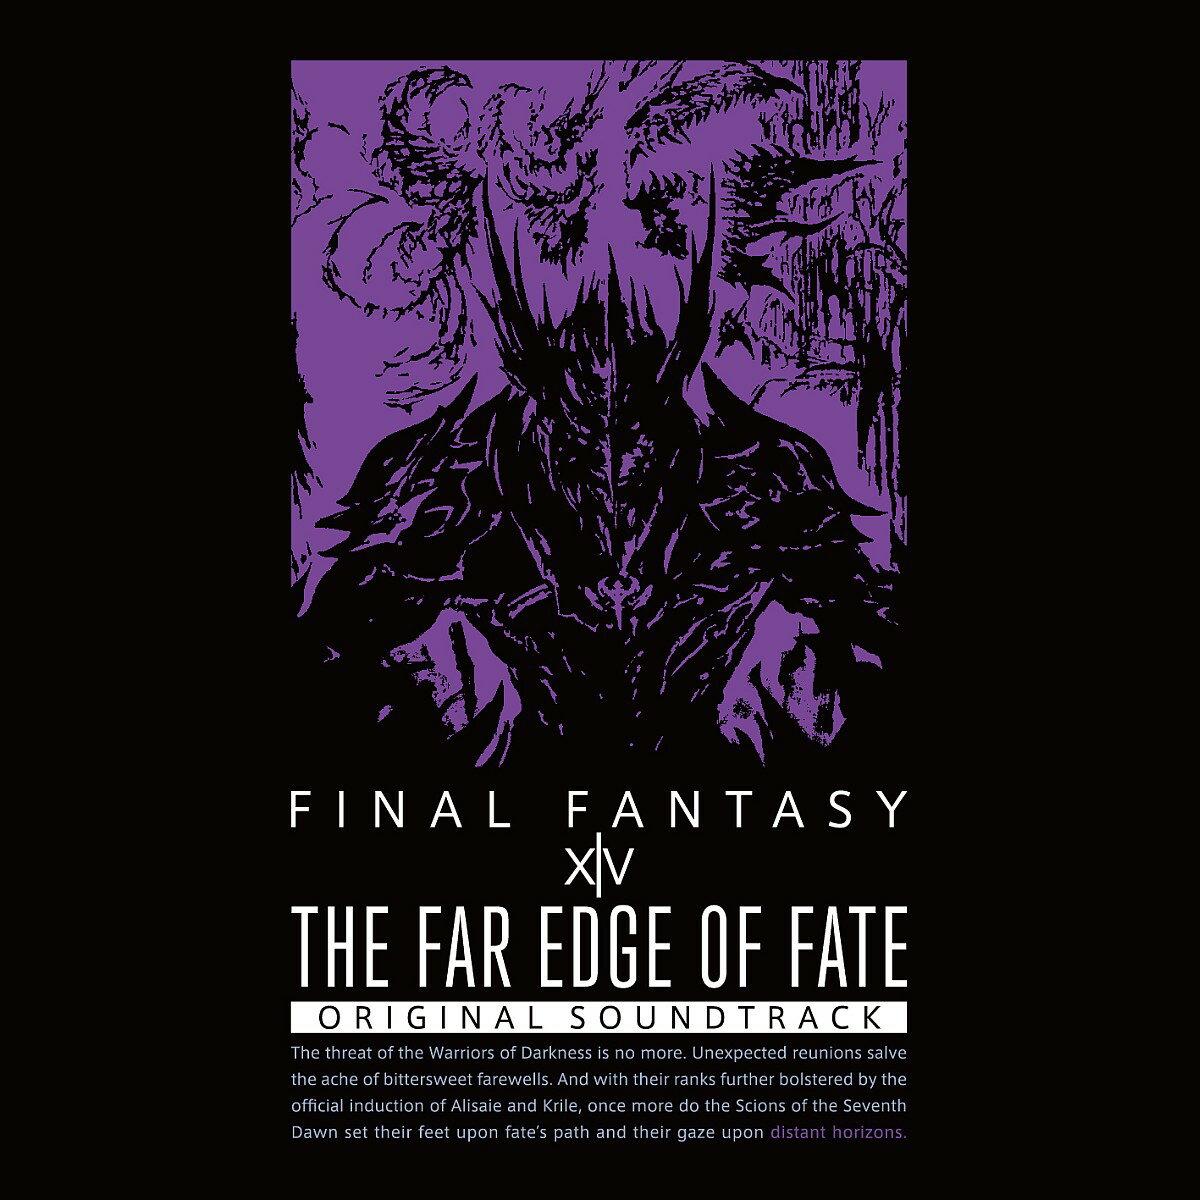 THE FAR EDGE OF FATE: FINAL FANTASY XIV ORIGINAL SOUNDTRACK(初回仕様限定盤)【映像付サントラ/Blu-ray Disc Music】